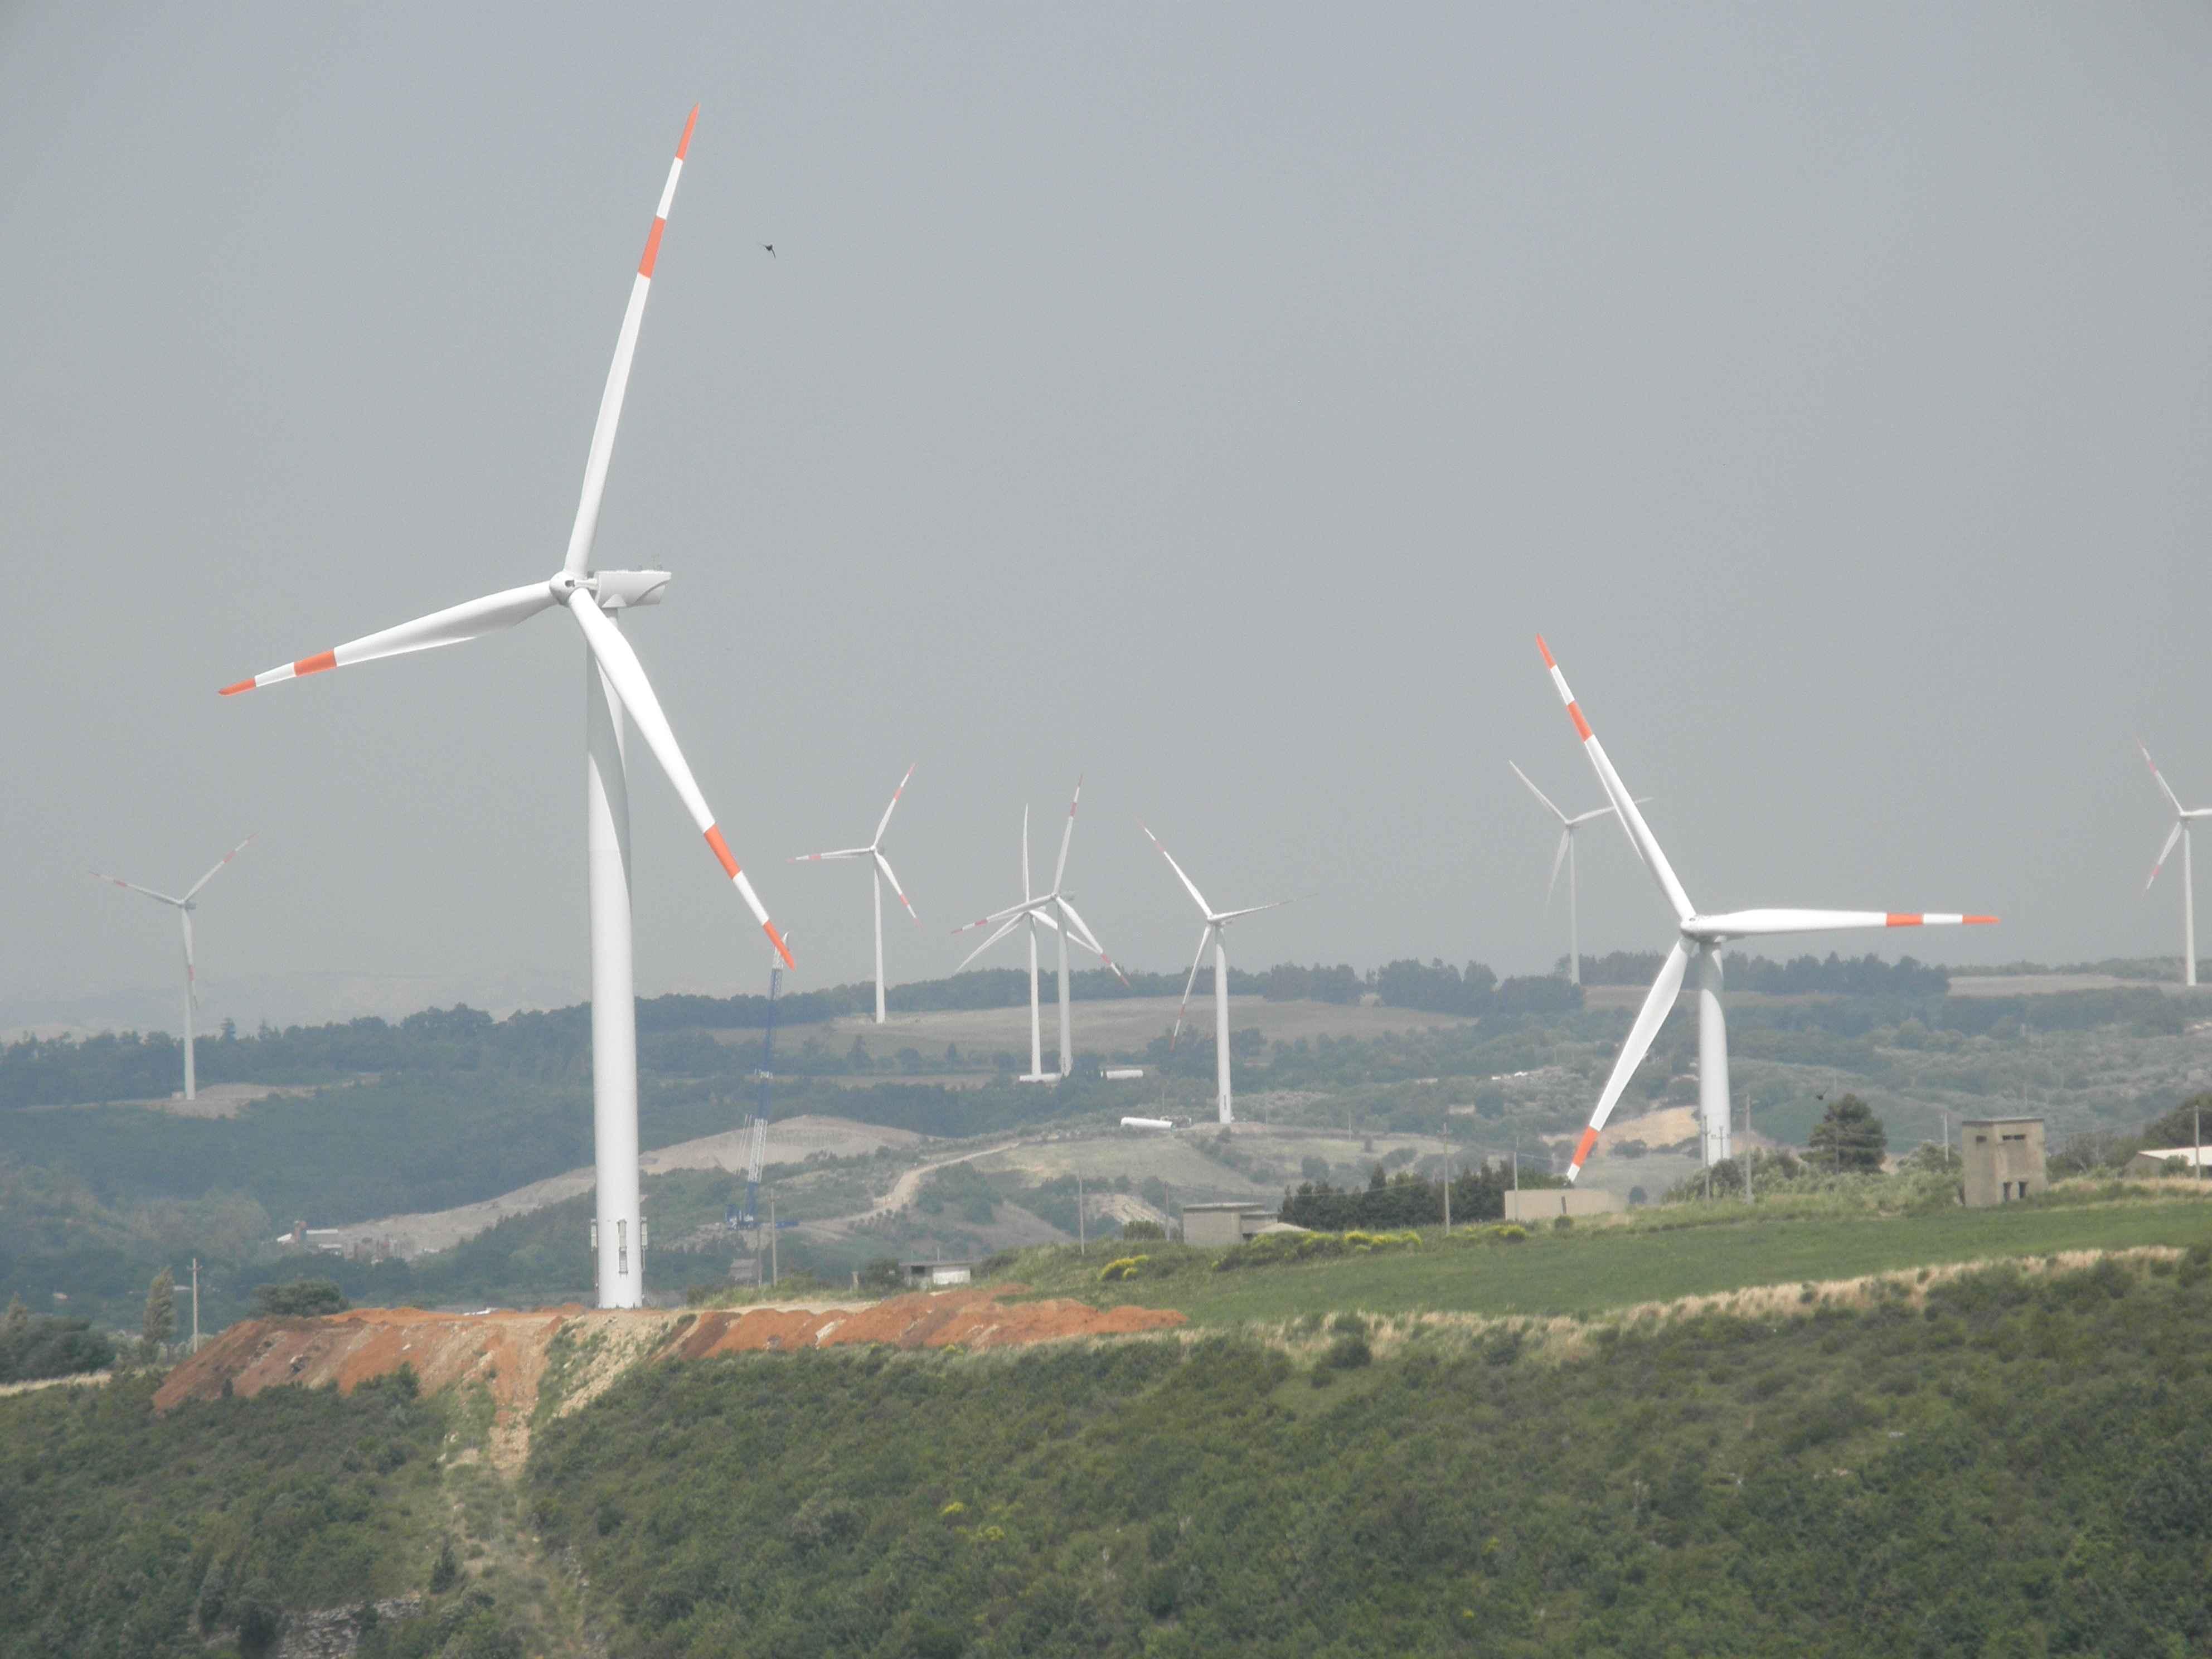 Calabria colonia energetica